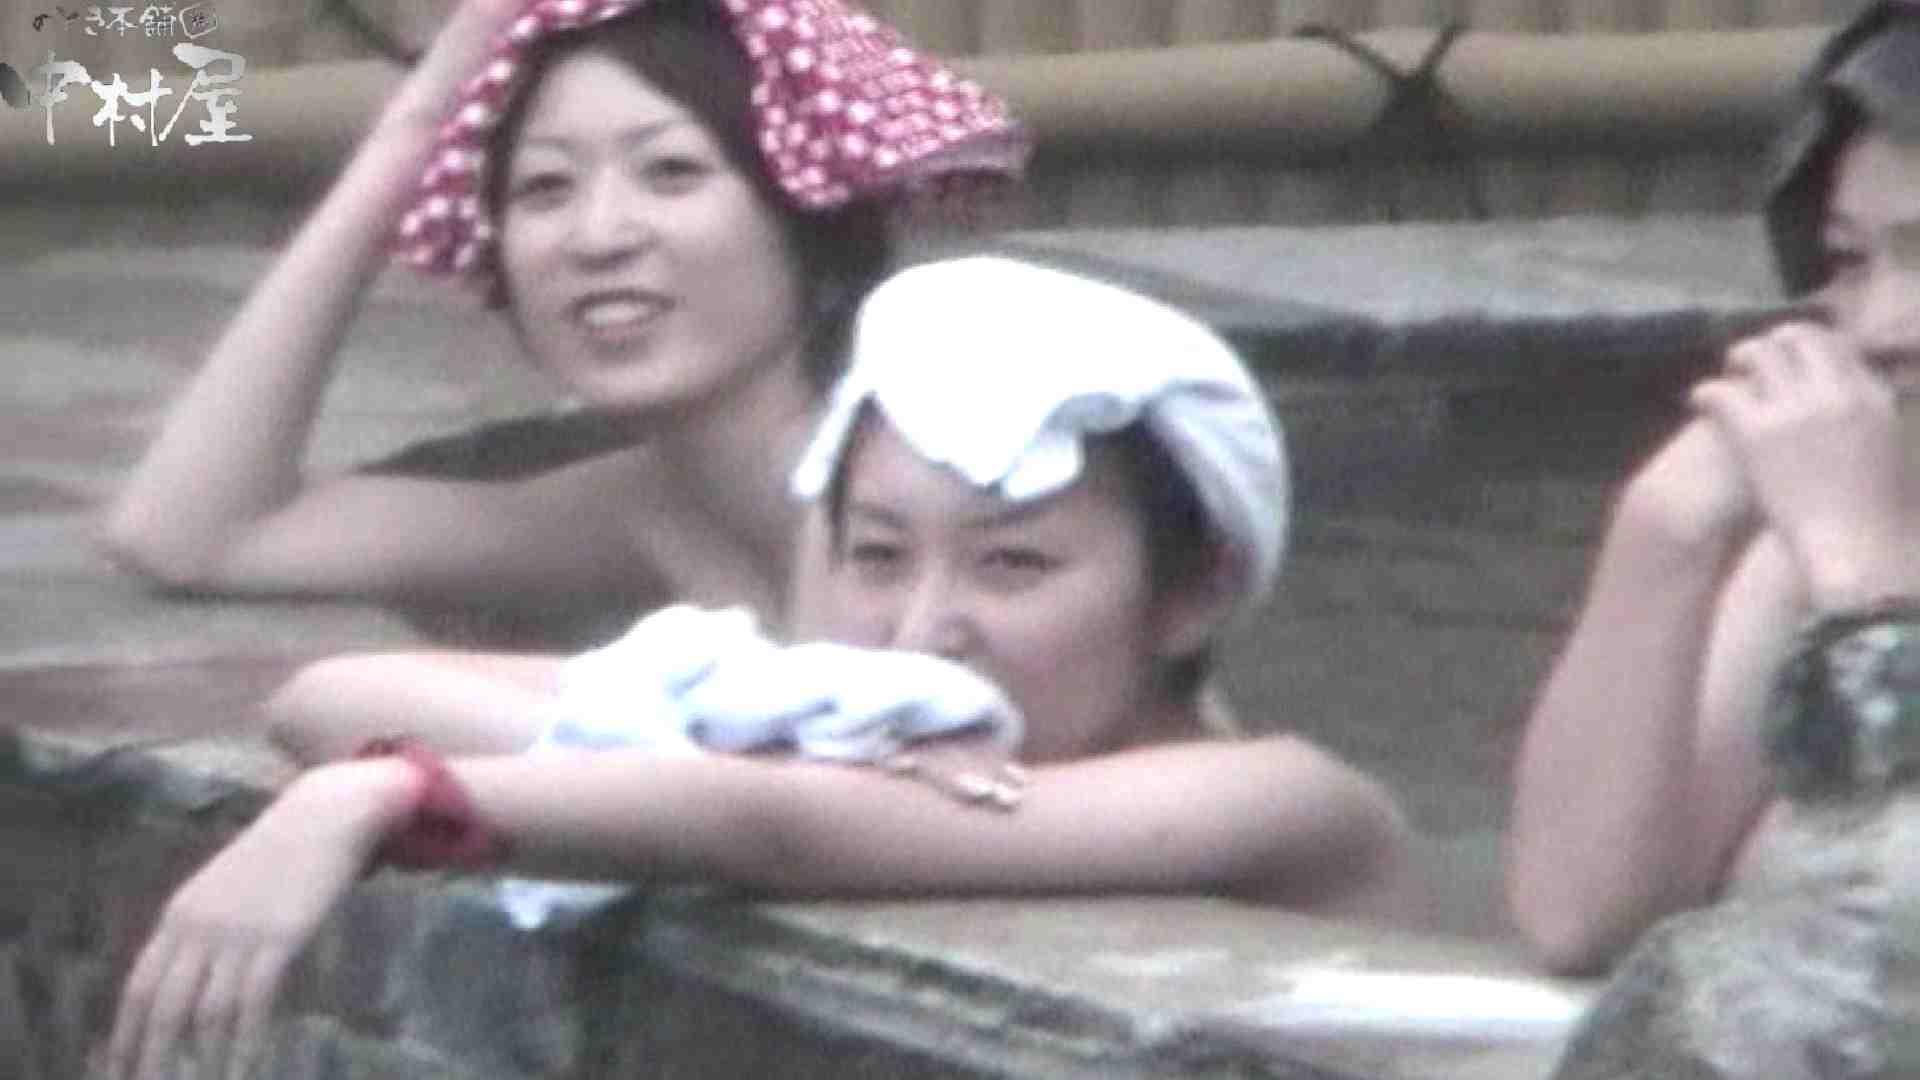 Aquaな露天風呂Vol.554 盗撮師作品 | 露天風呂突入  86pic 10